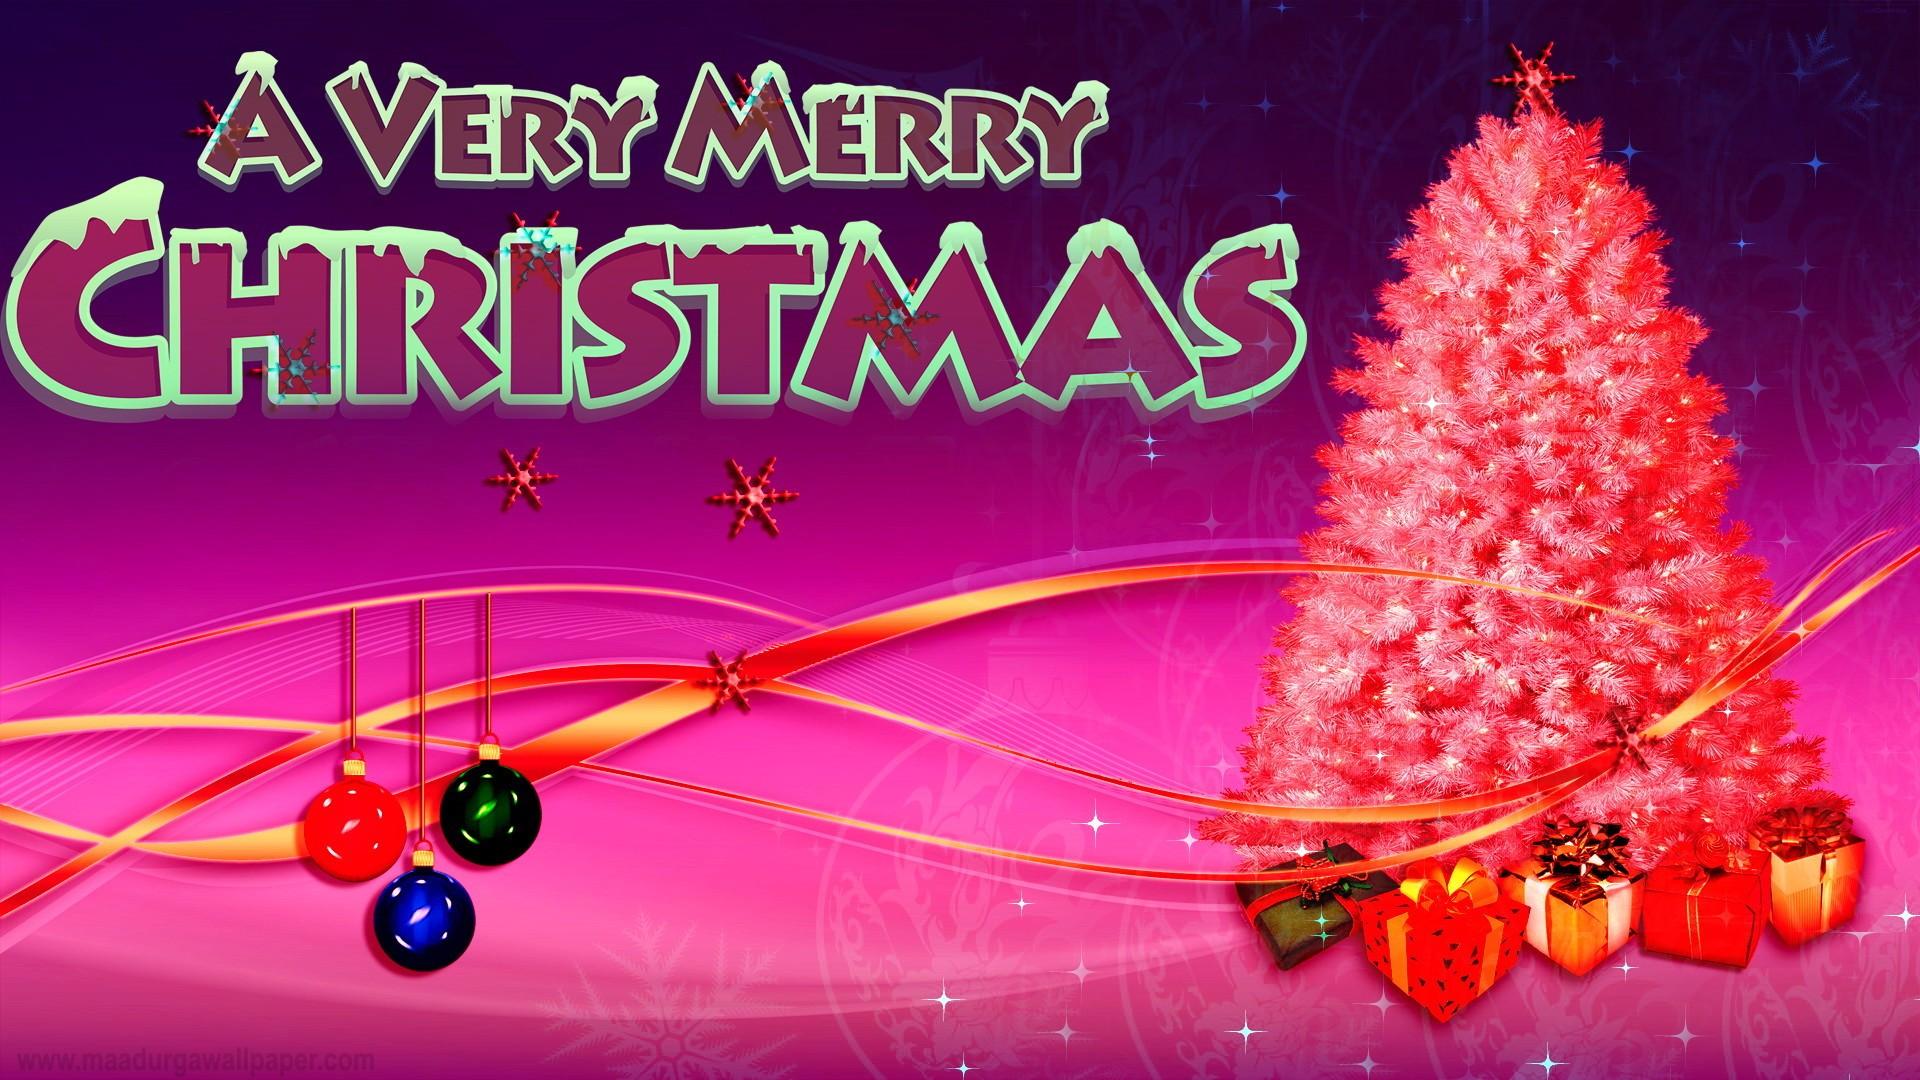 christmas computer wallpaper download free amazing hd